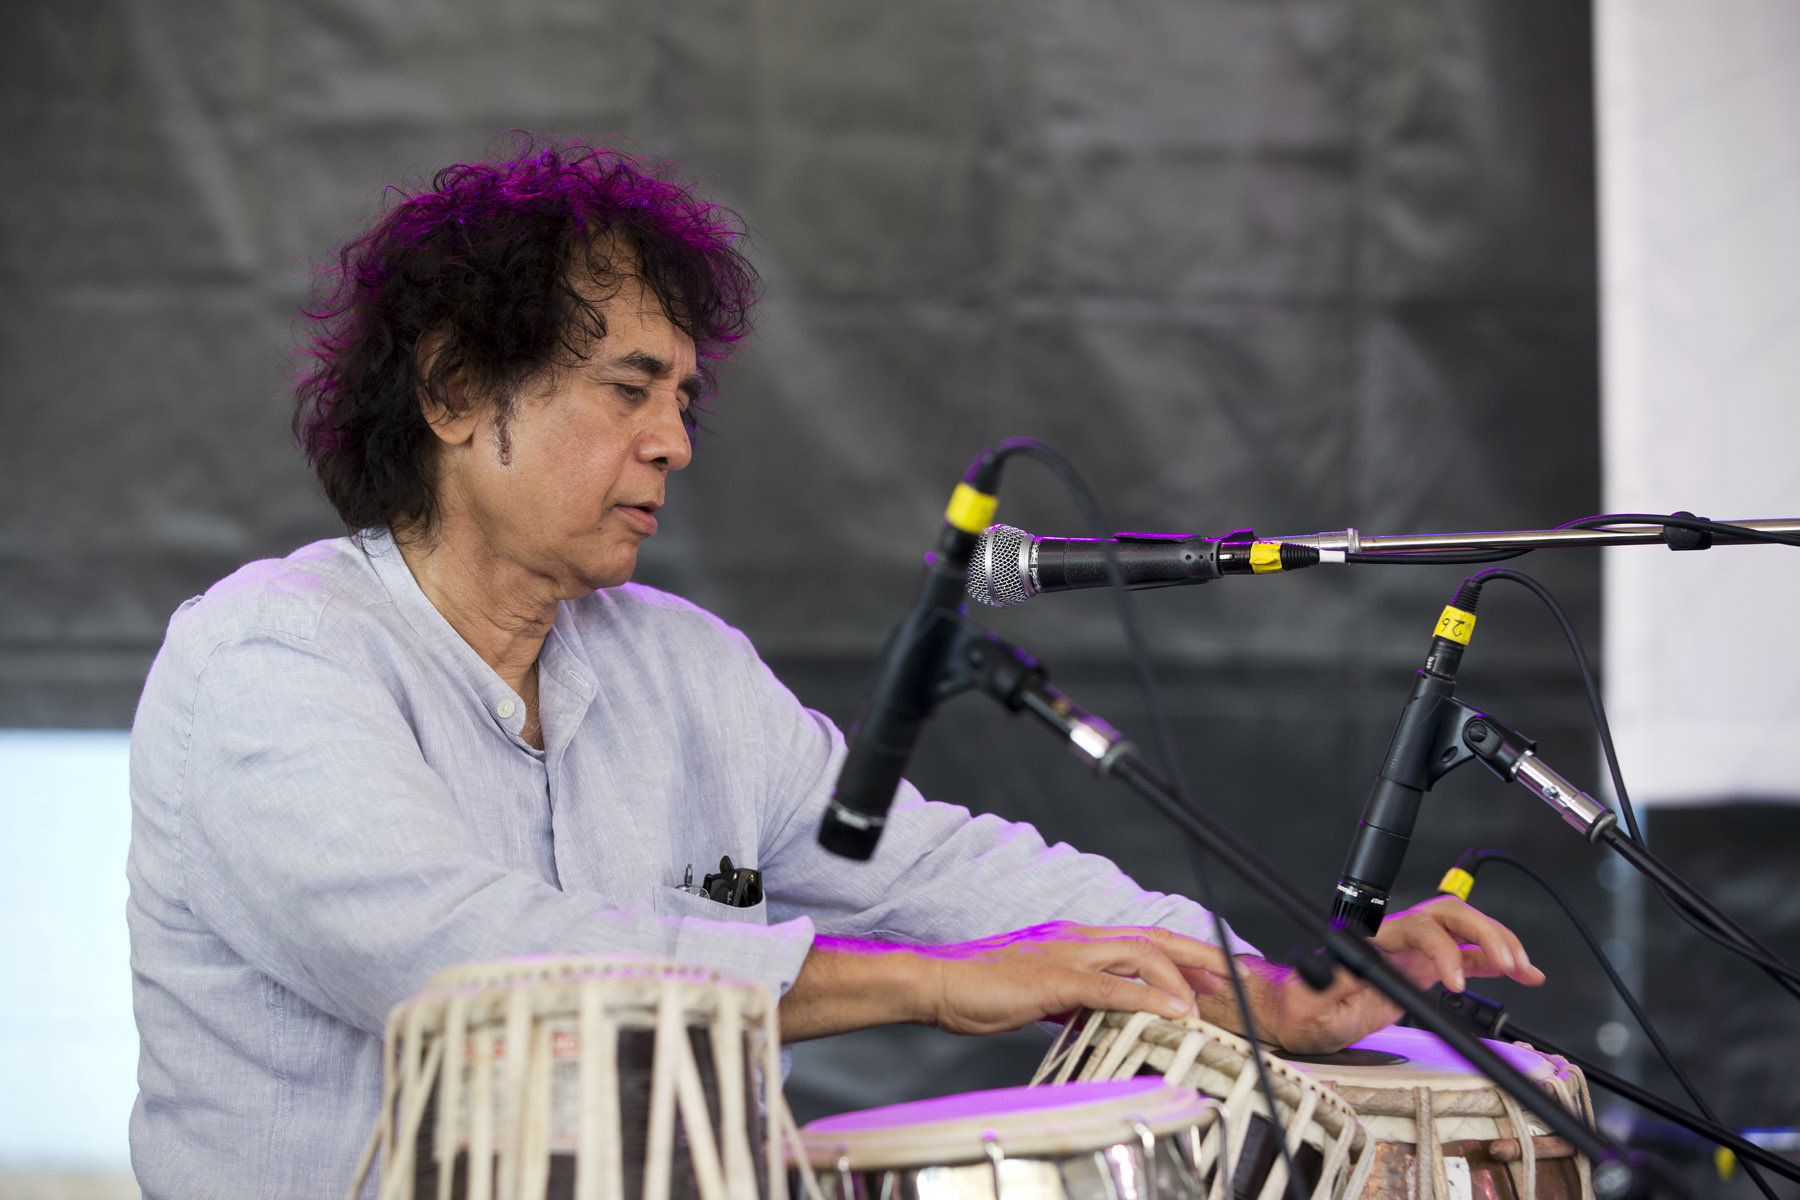 Zakir Hussain at the 2018 Newport Jazz Festival